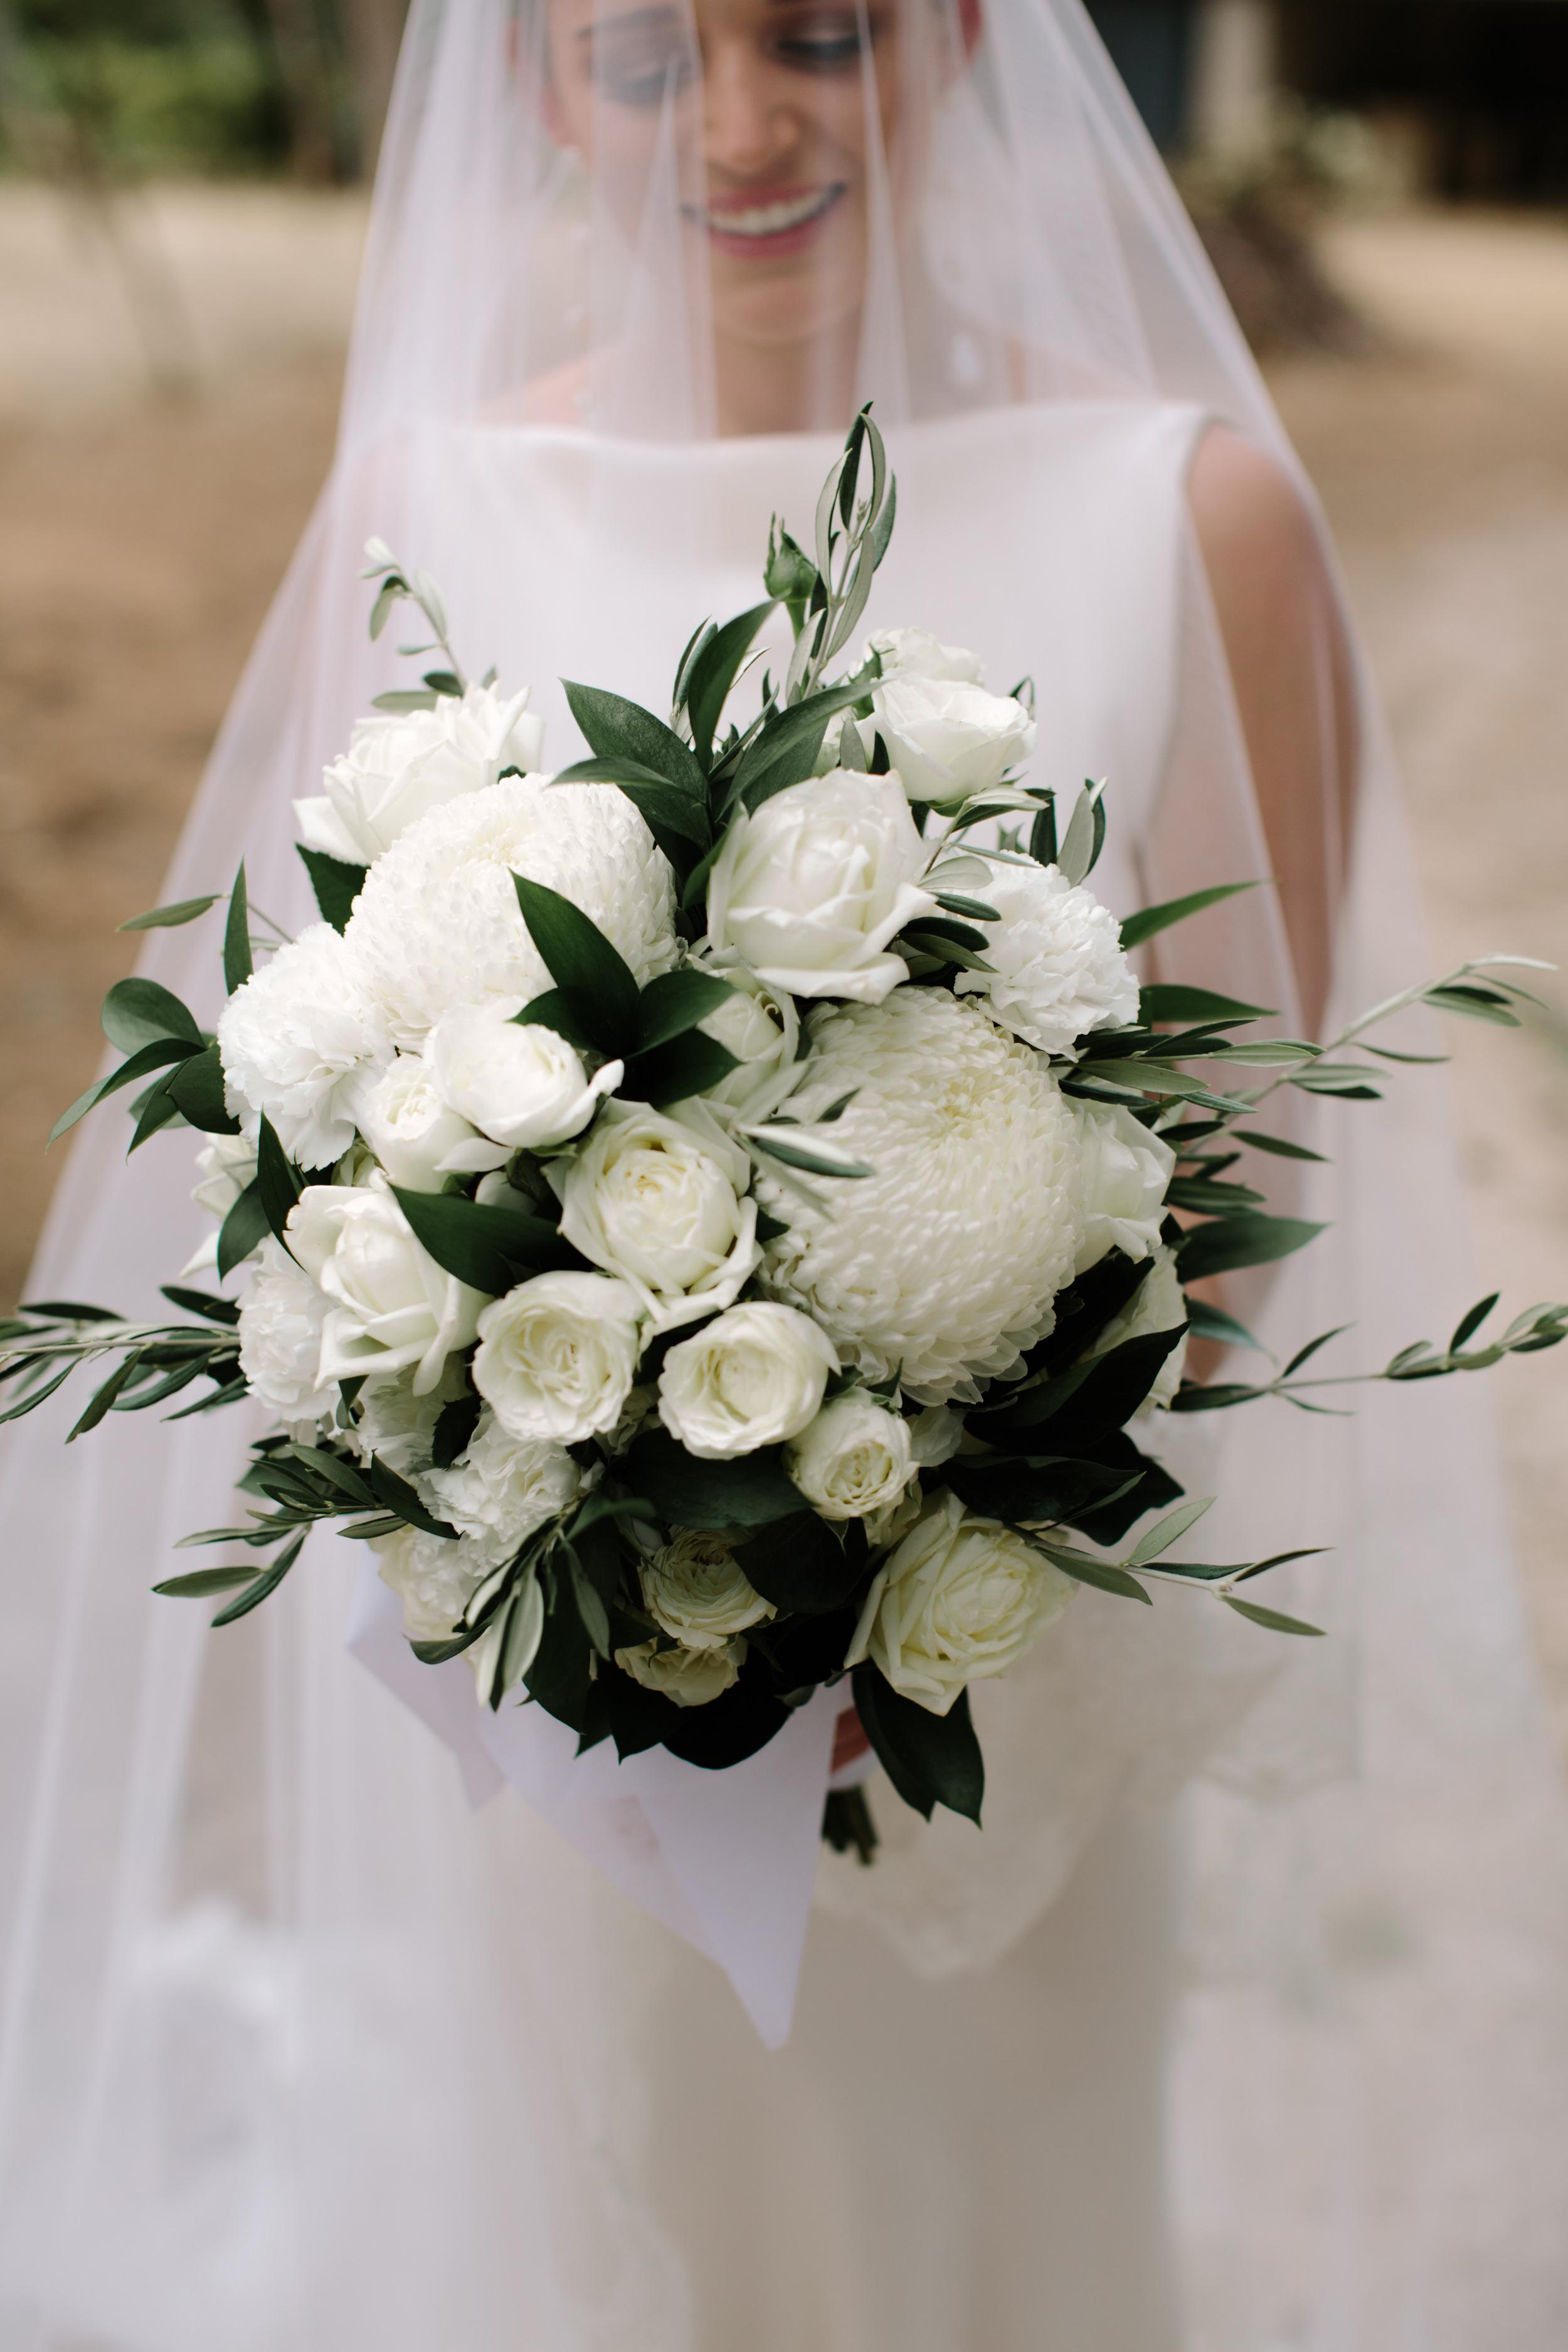 I-Got-You-Babe-Weddings-Vic-Siggy-Barossa-Valley0053.JPG